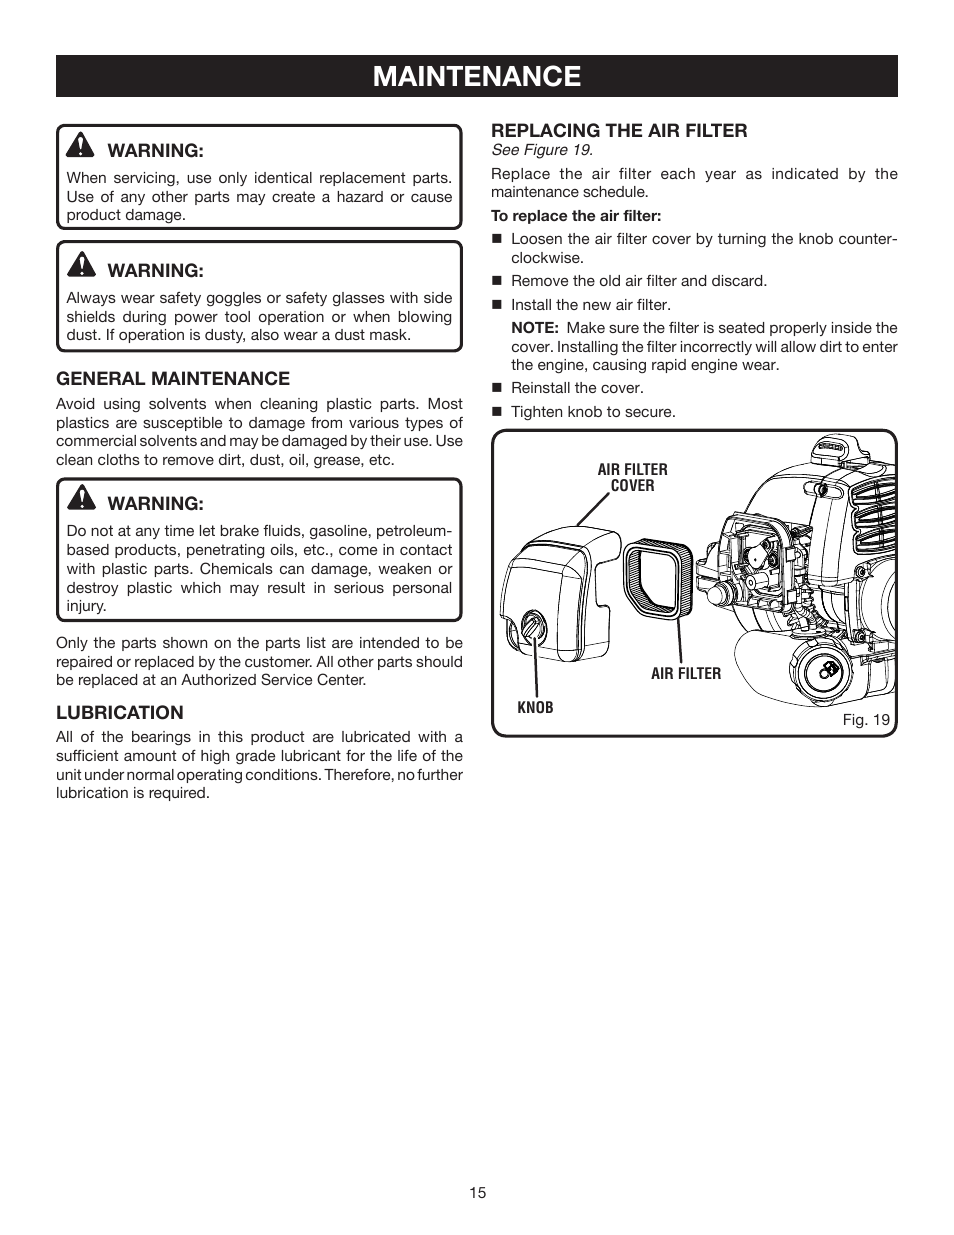 maintenance ryobi ry60520 user manual page 15 22 original mode rh manualsdir com Ryobi Parts Ryobi Manual P2006a